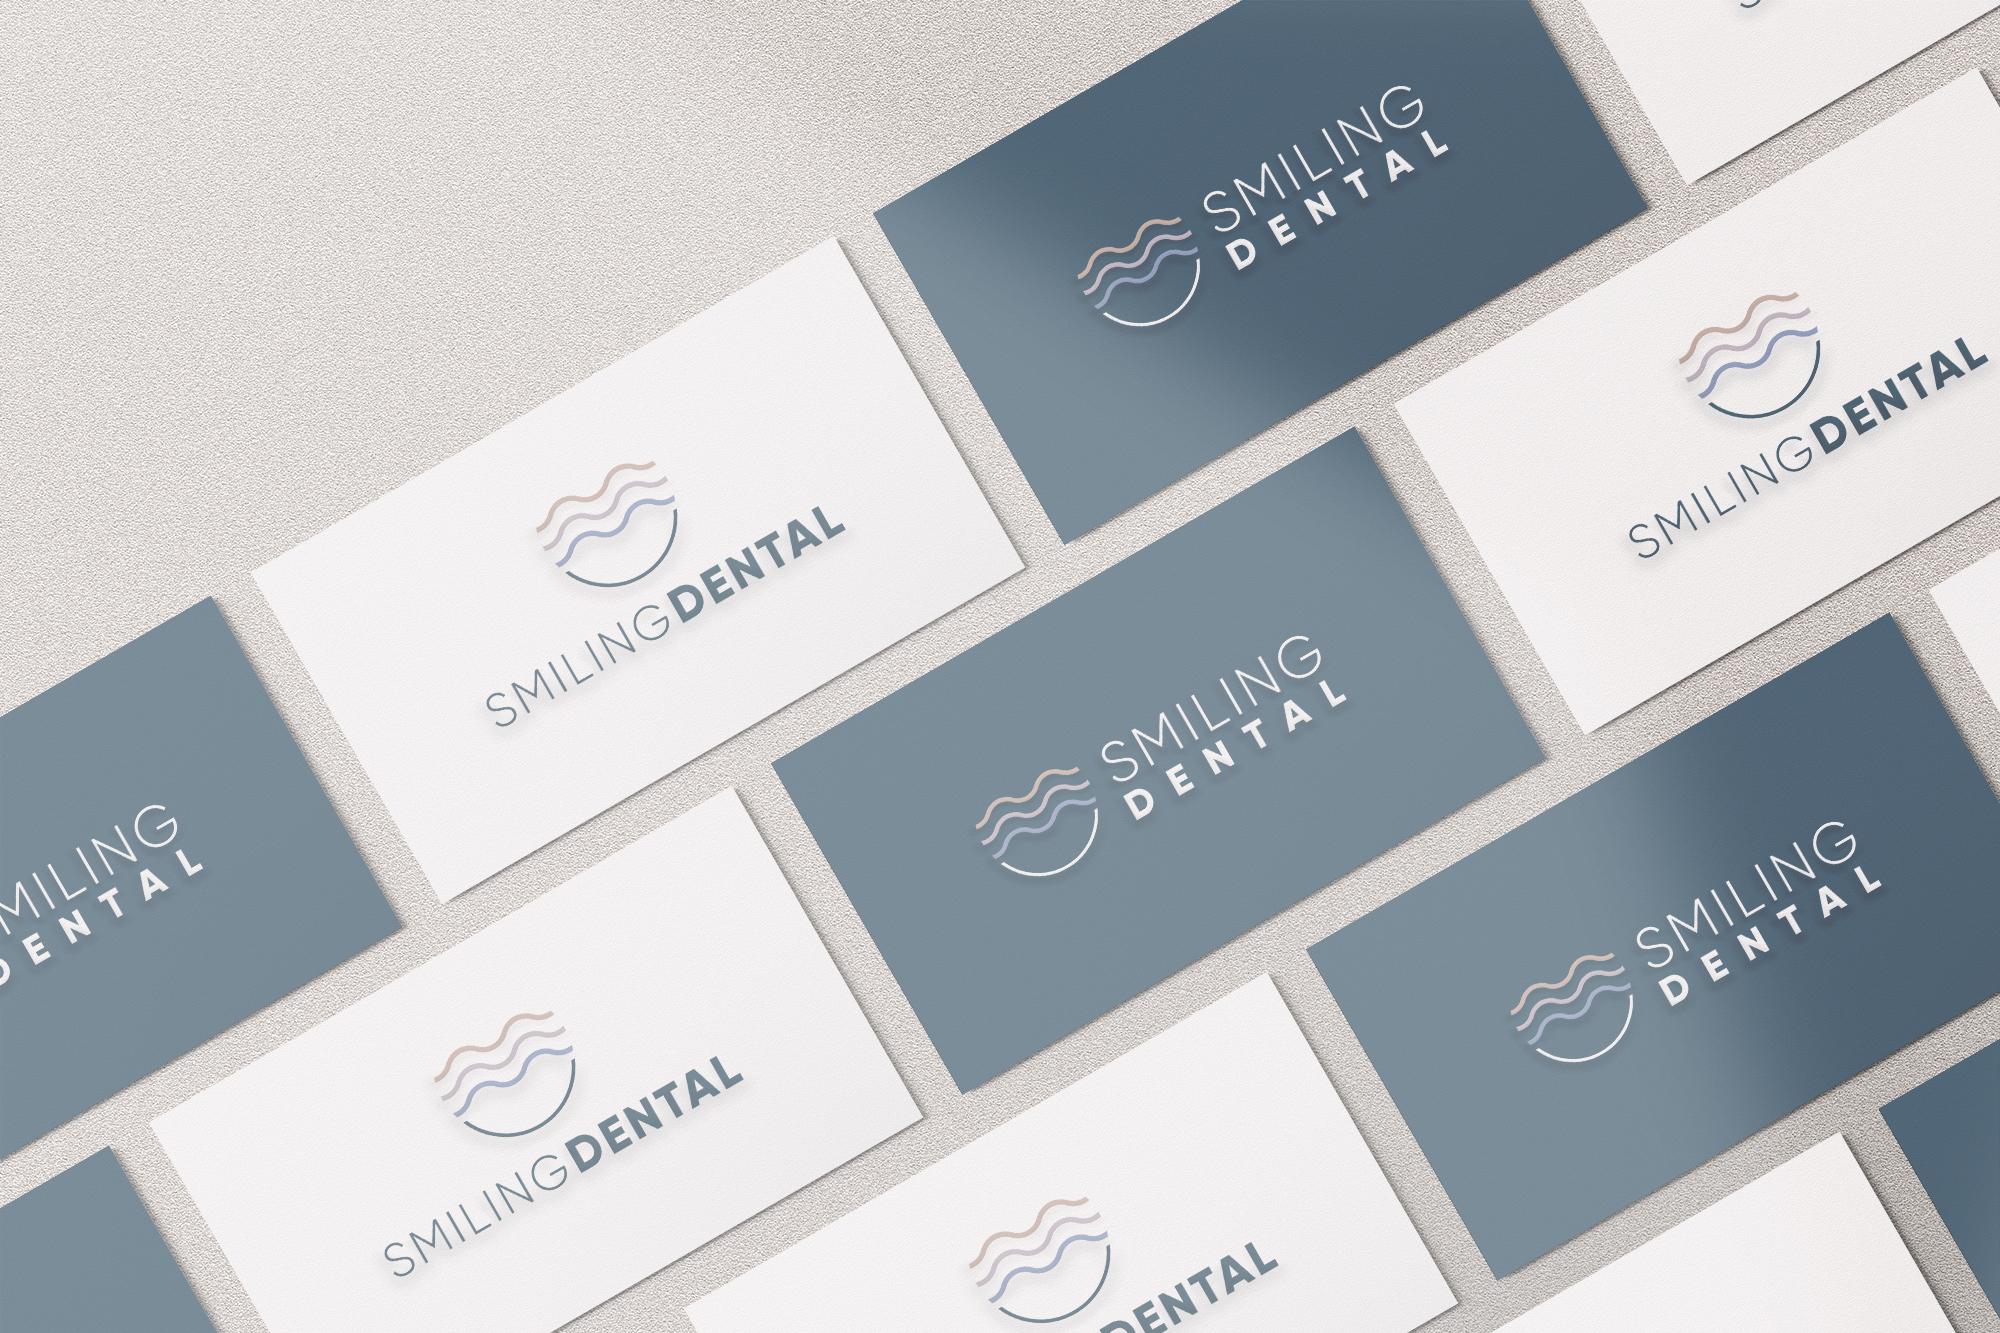 Smilingdental_cards